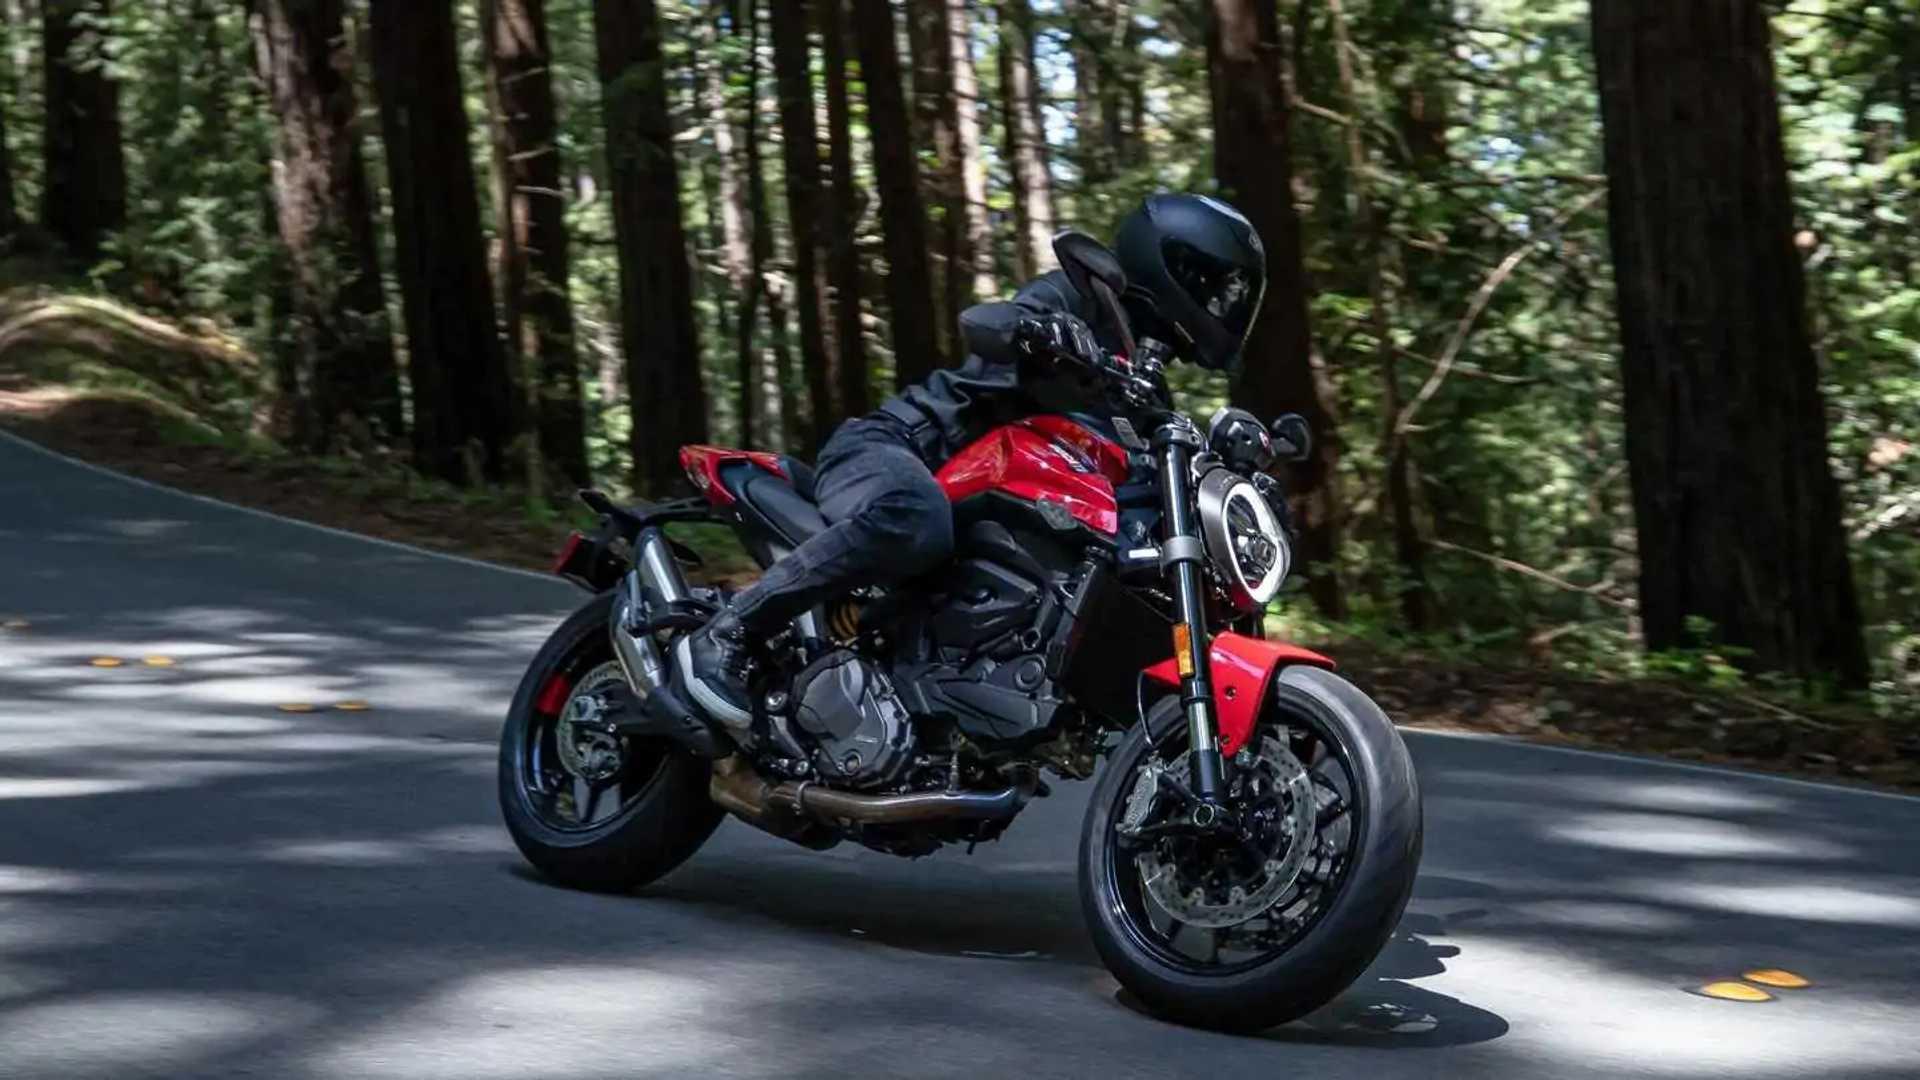 Pando Moto Robby Arm 01 Riding Jeans - Ducati Monster